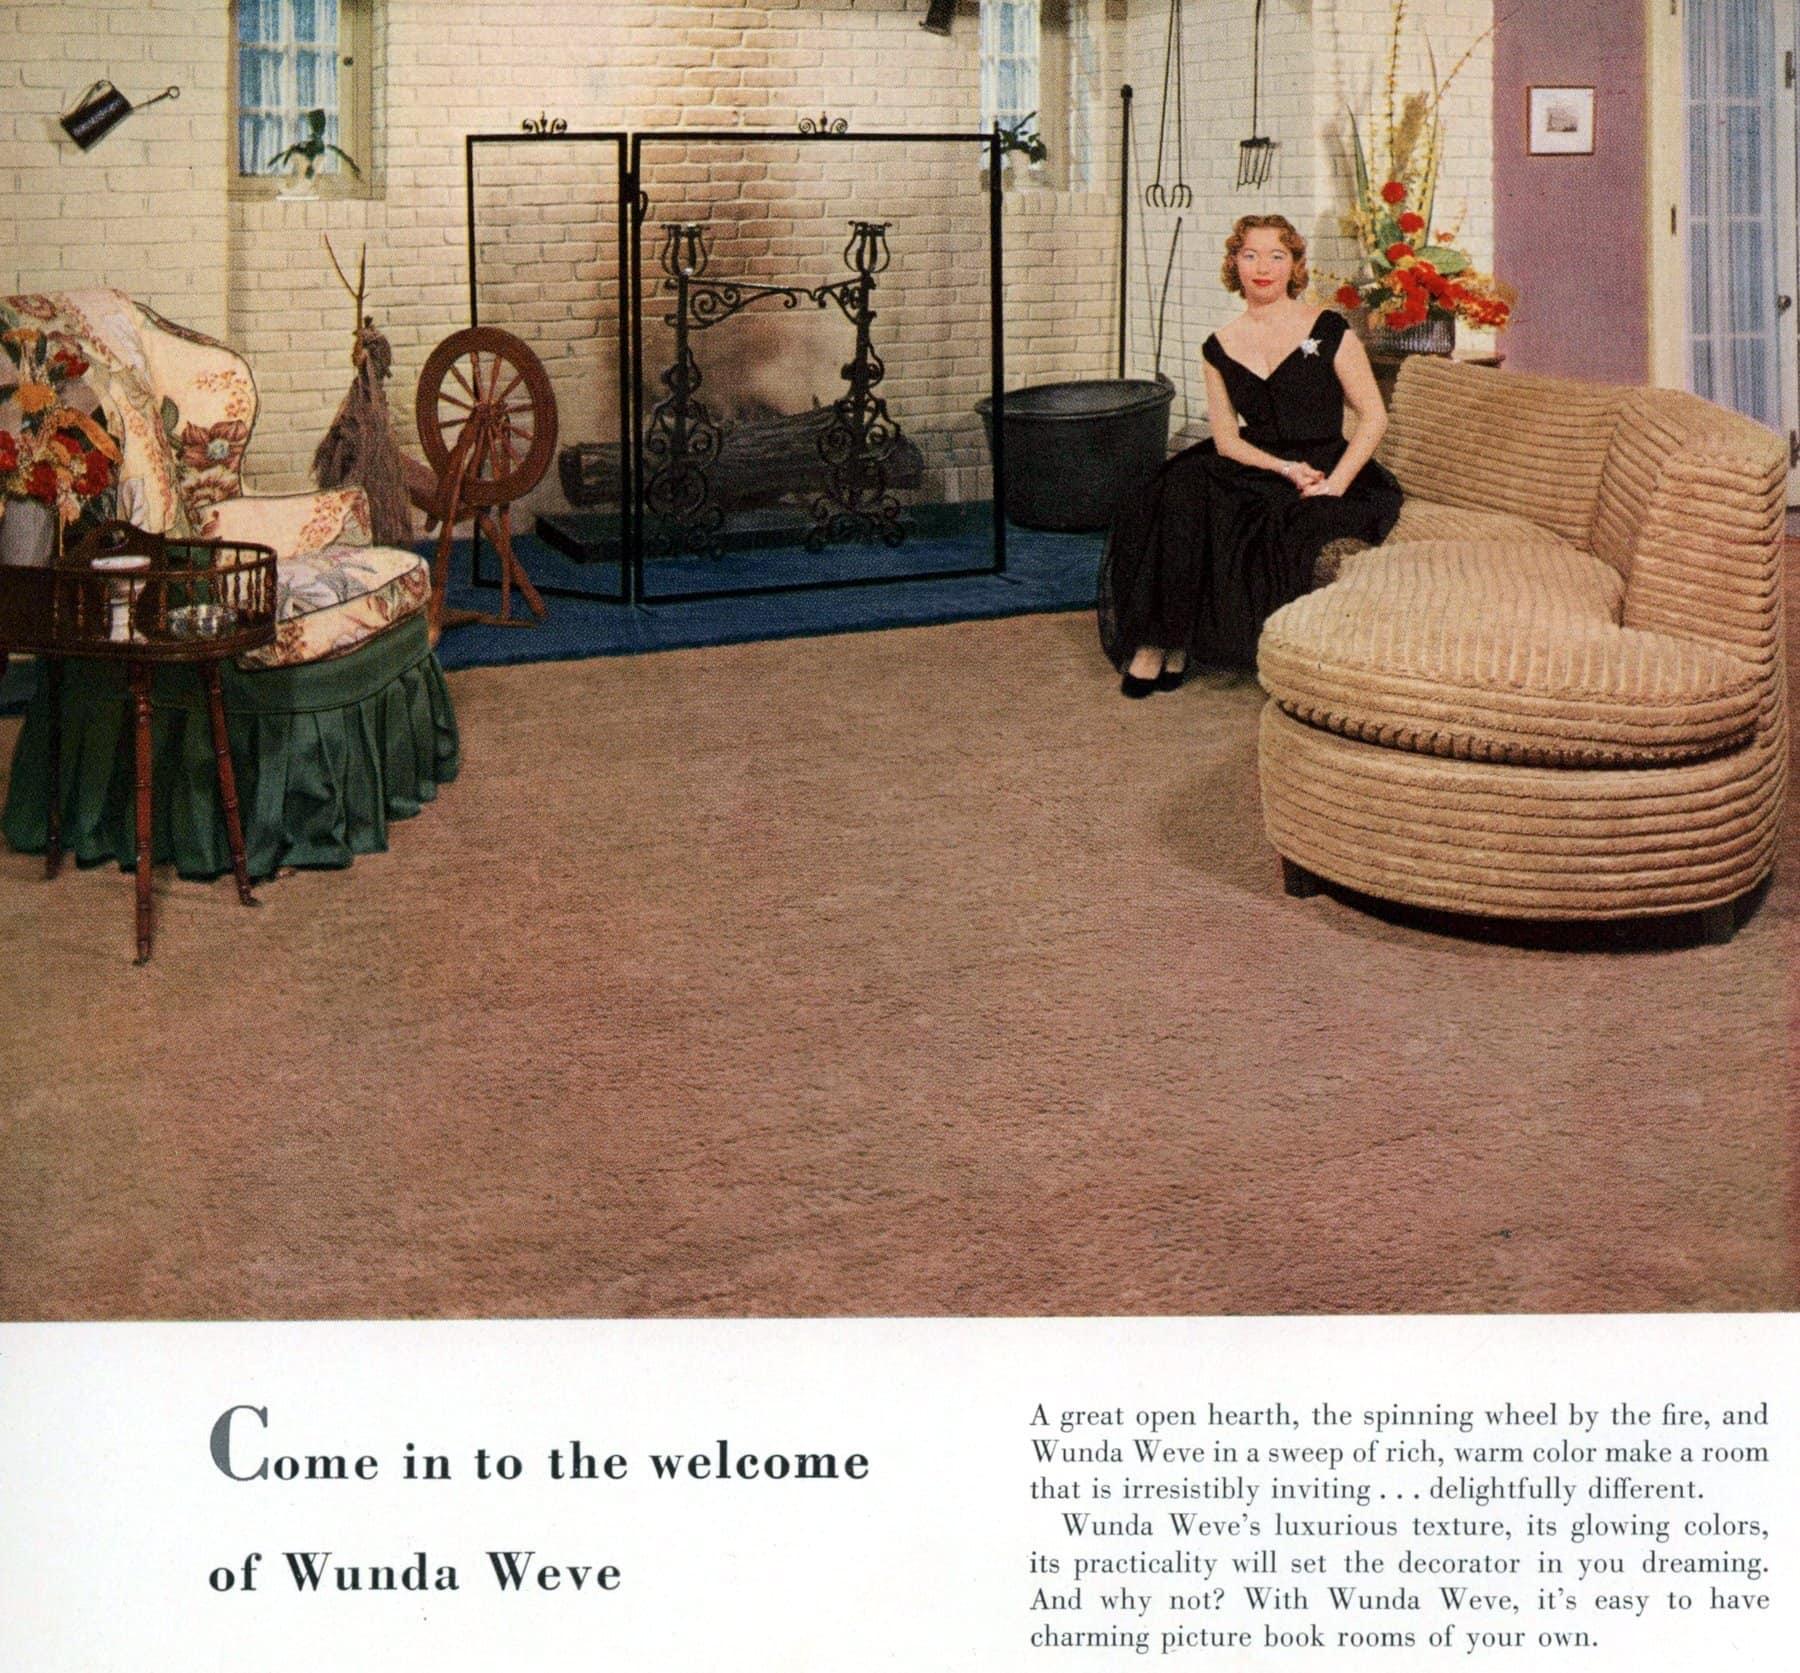 1950s Wunda Weve textured carpeting in brown